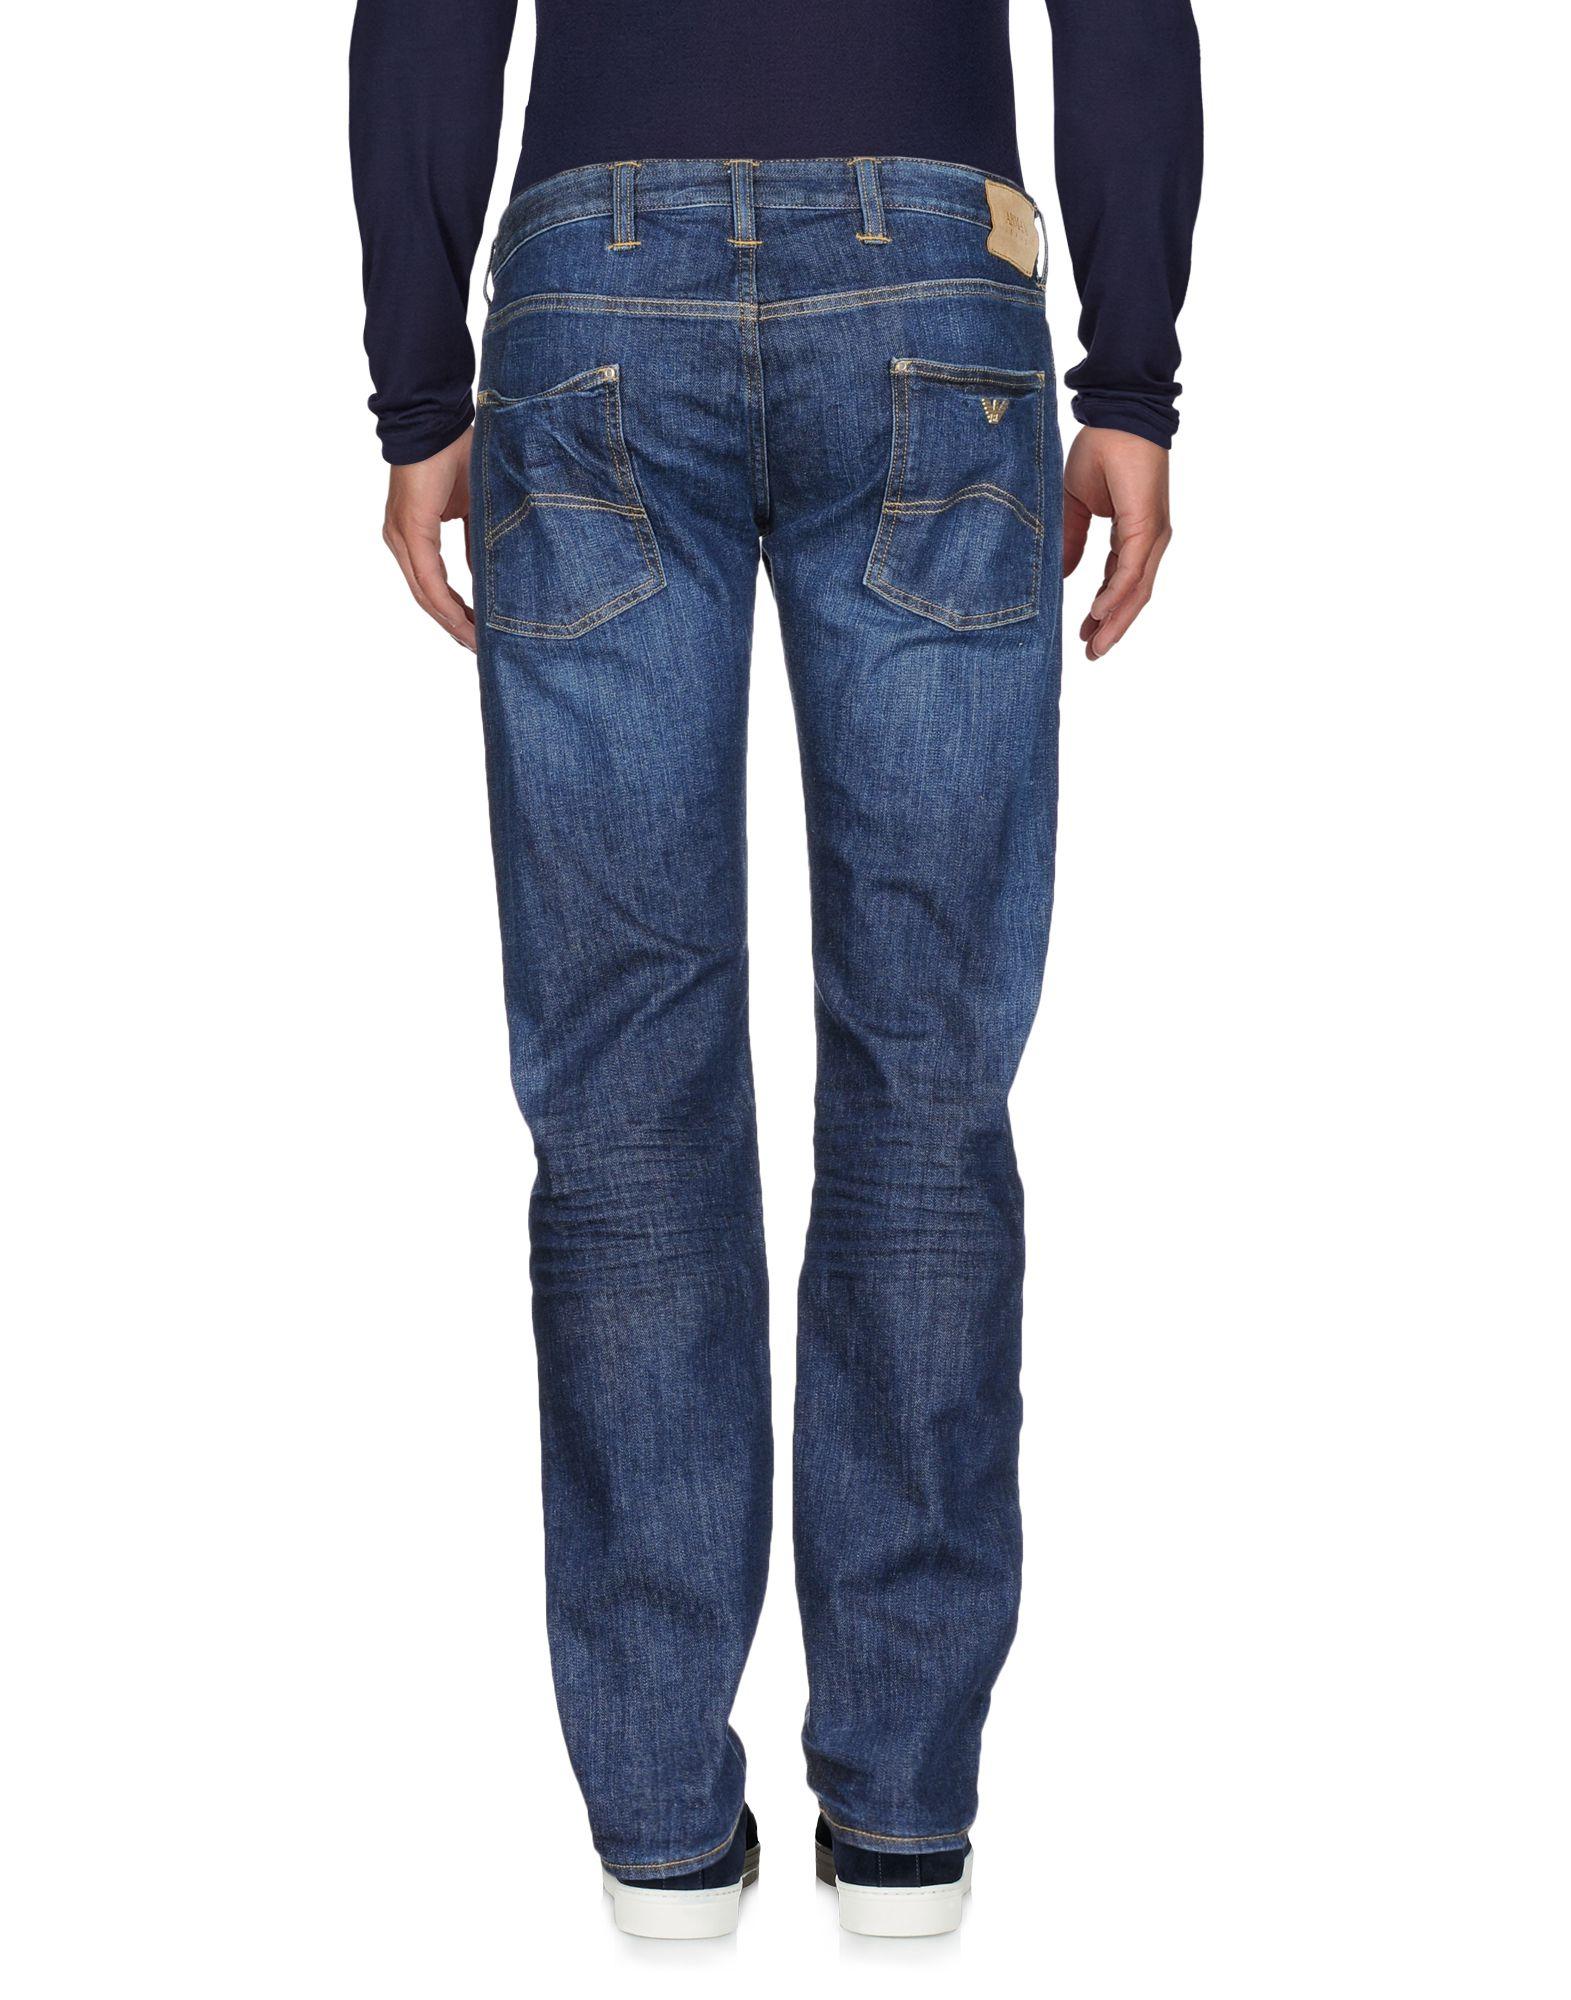 Pantaloni Jeans Armani Jeans Uomo - - Uomo 42669131WS ceea8d